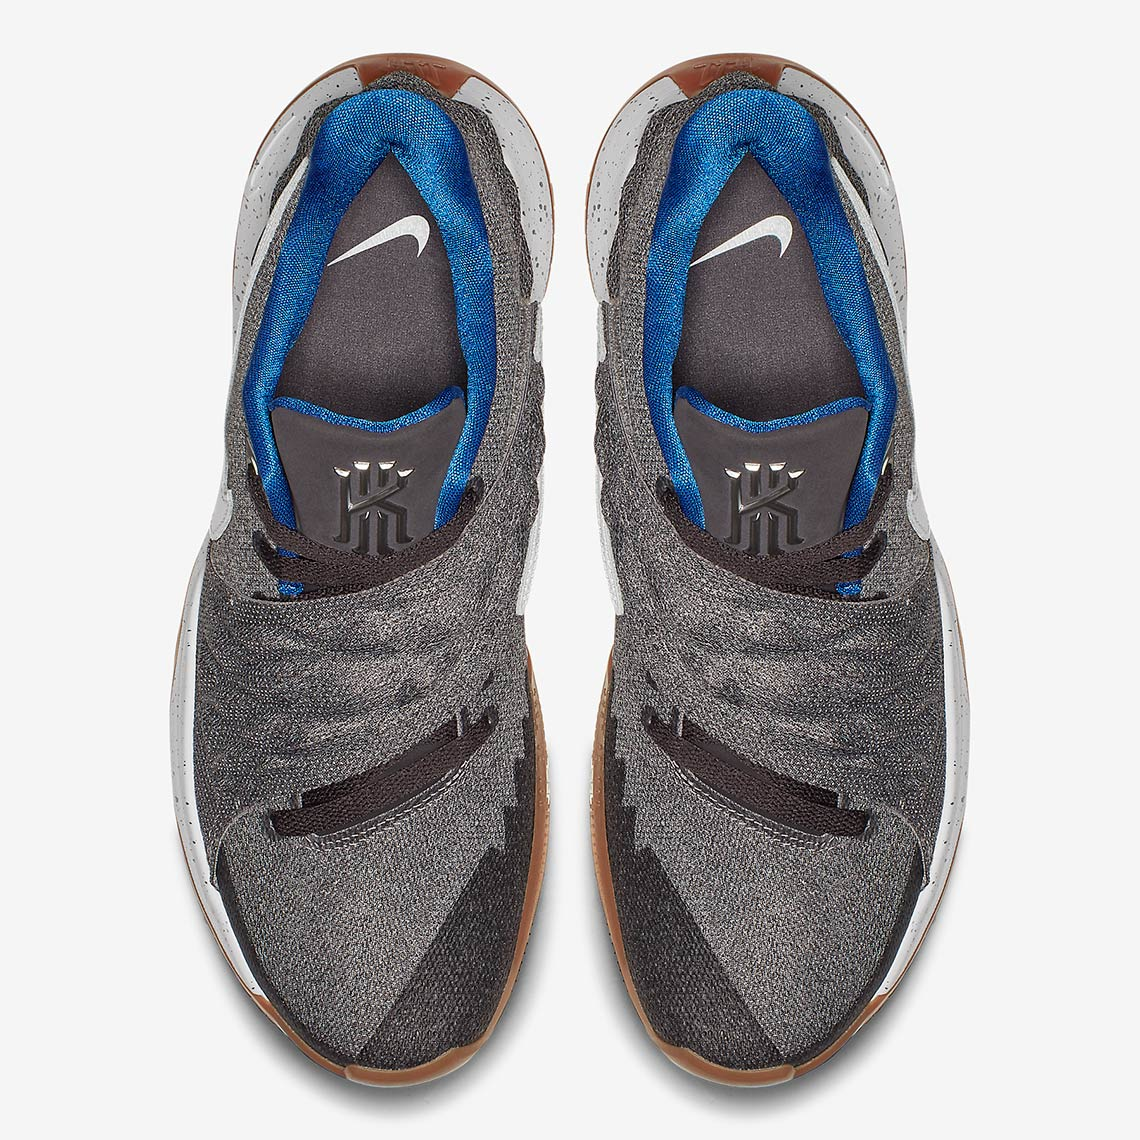 reputable site 17cfc b297a Nike Kyrie 1 Low AO8979-005 Release Info | SneakerNews.com